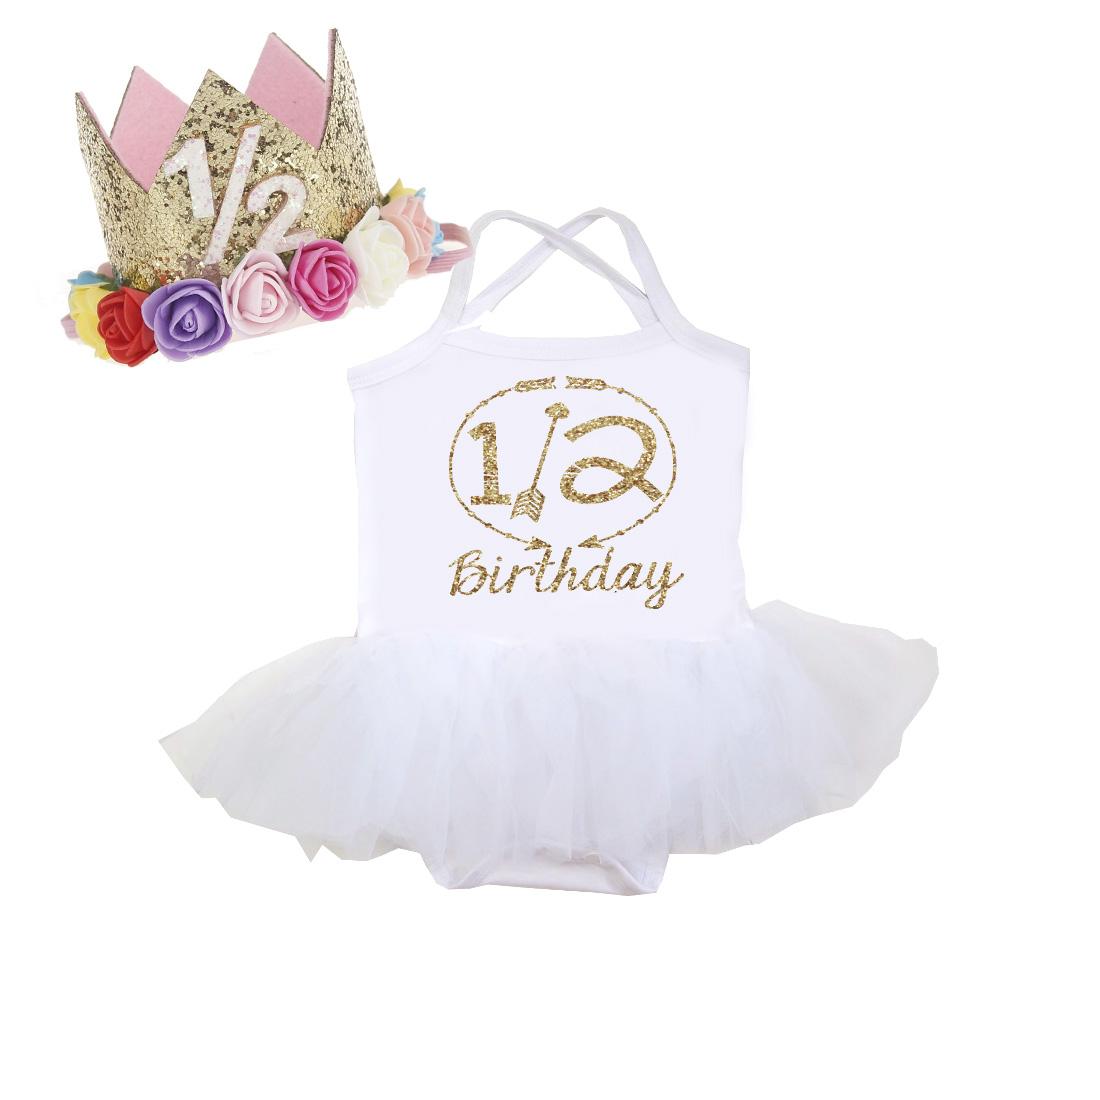 Custom Order For Kellye 1/2 Birthday Onesies or Little Boy Shirt